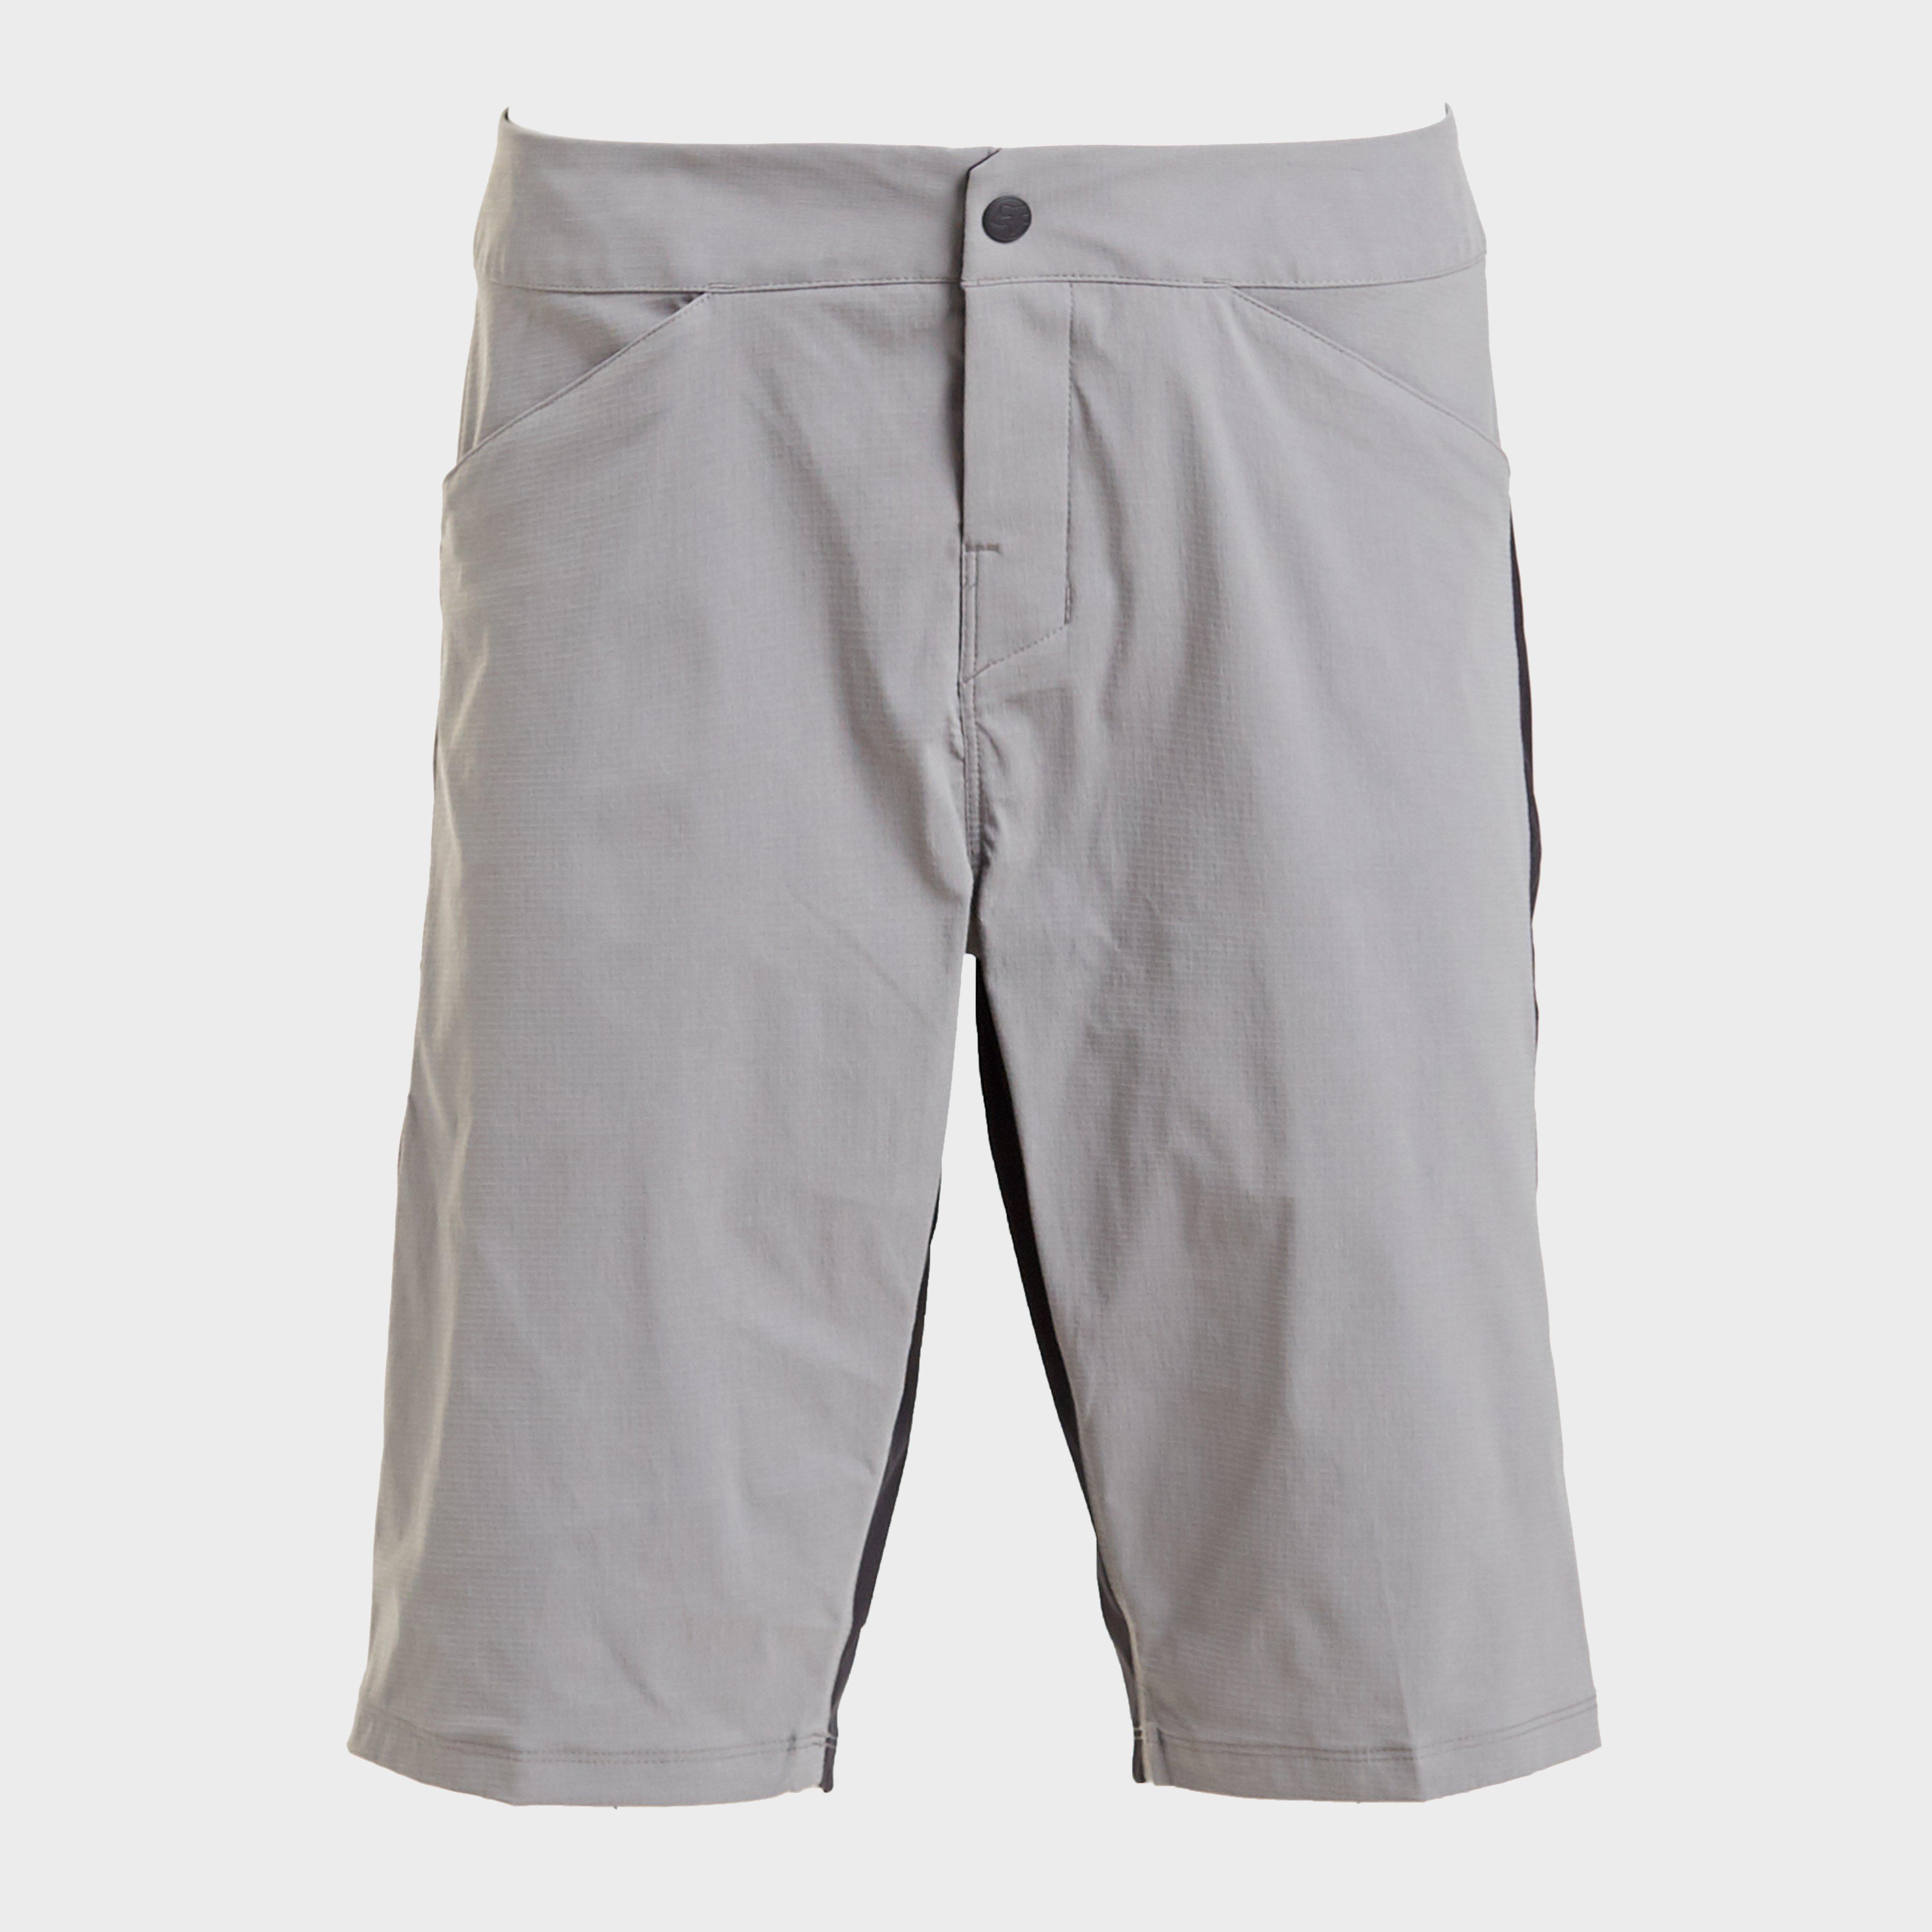 FOX Fox Ranger Water Resistant Shorts, Grey